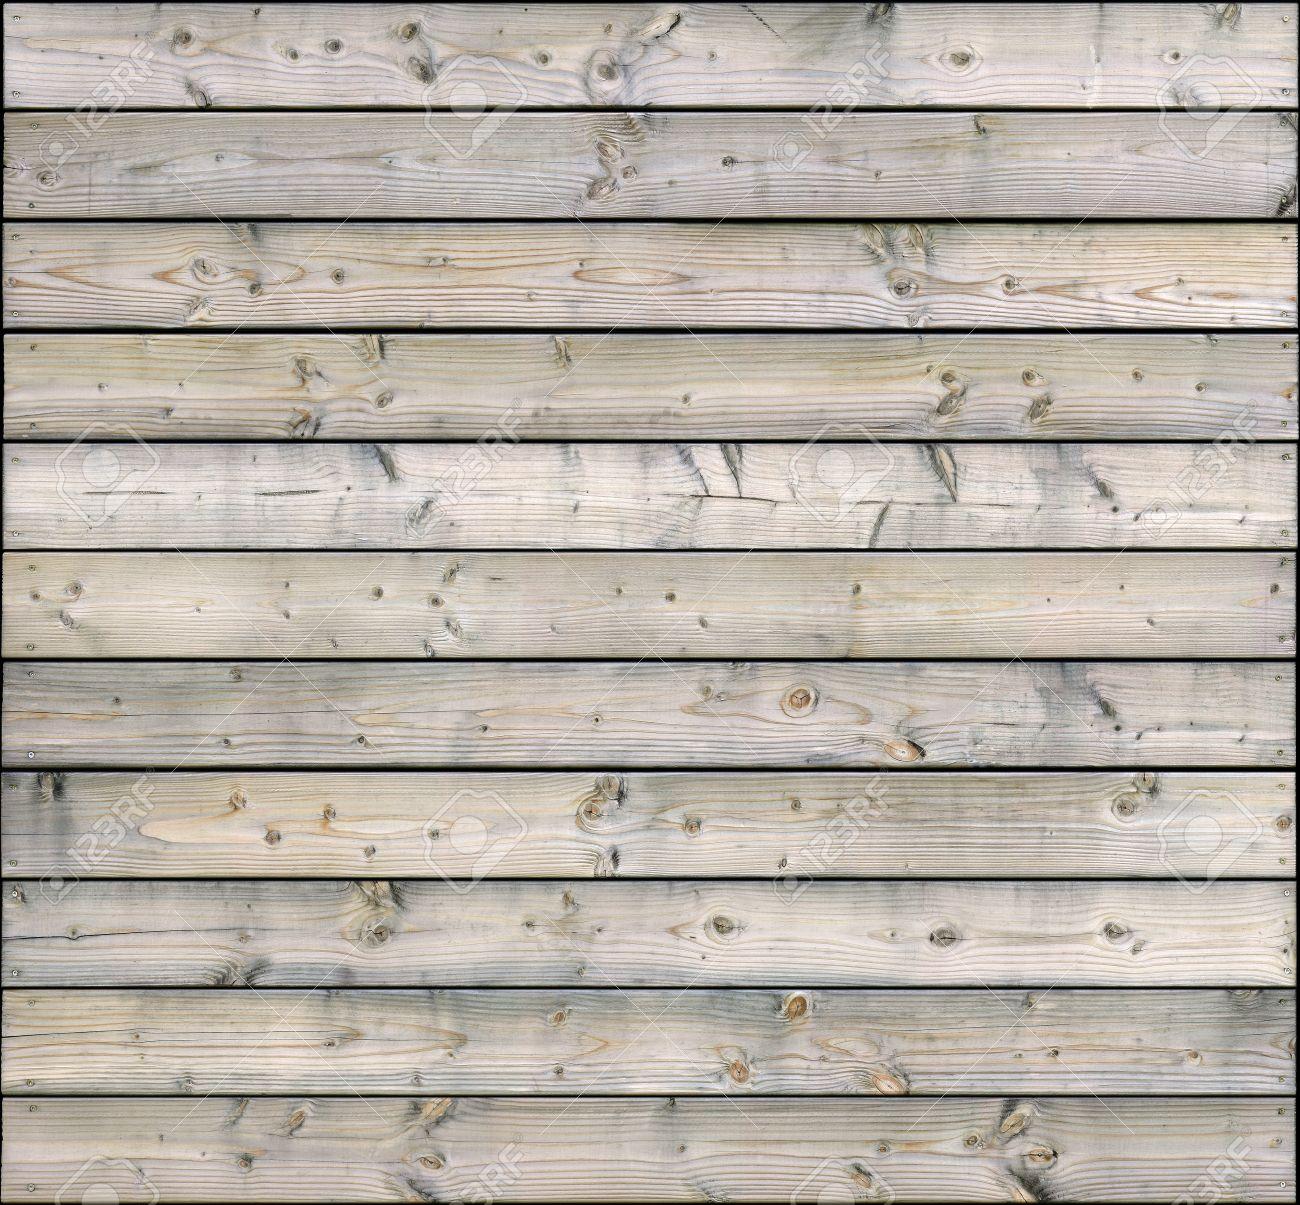 Stock Photo high resolution horizontal wooden planks texture  High  Resolution Horizontal Wooden Planks Texture Stock. Texture Horizontal Wooden Siding